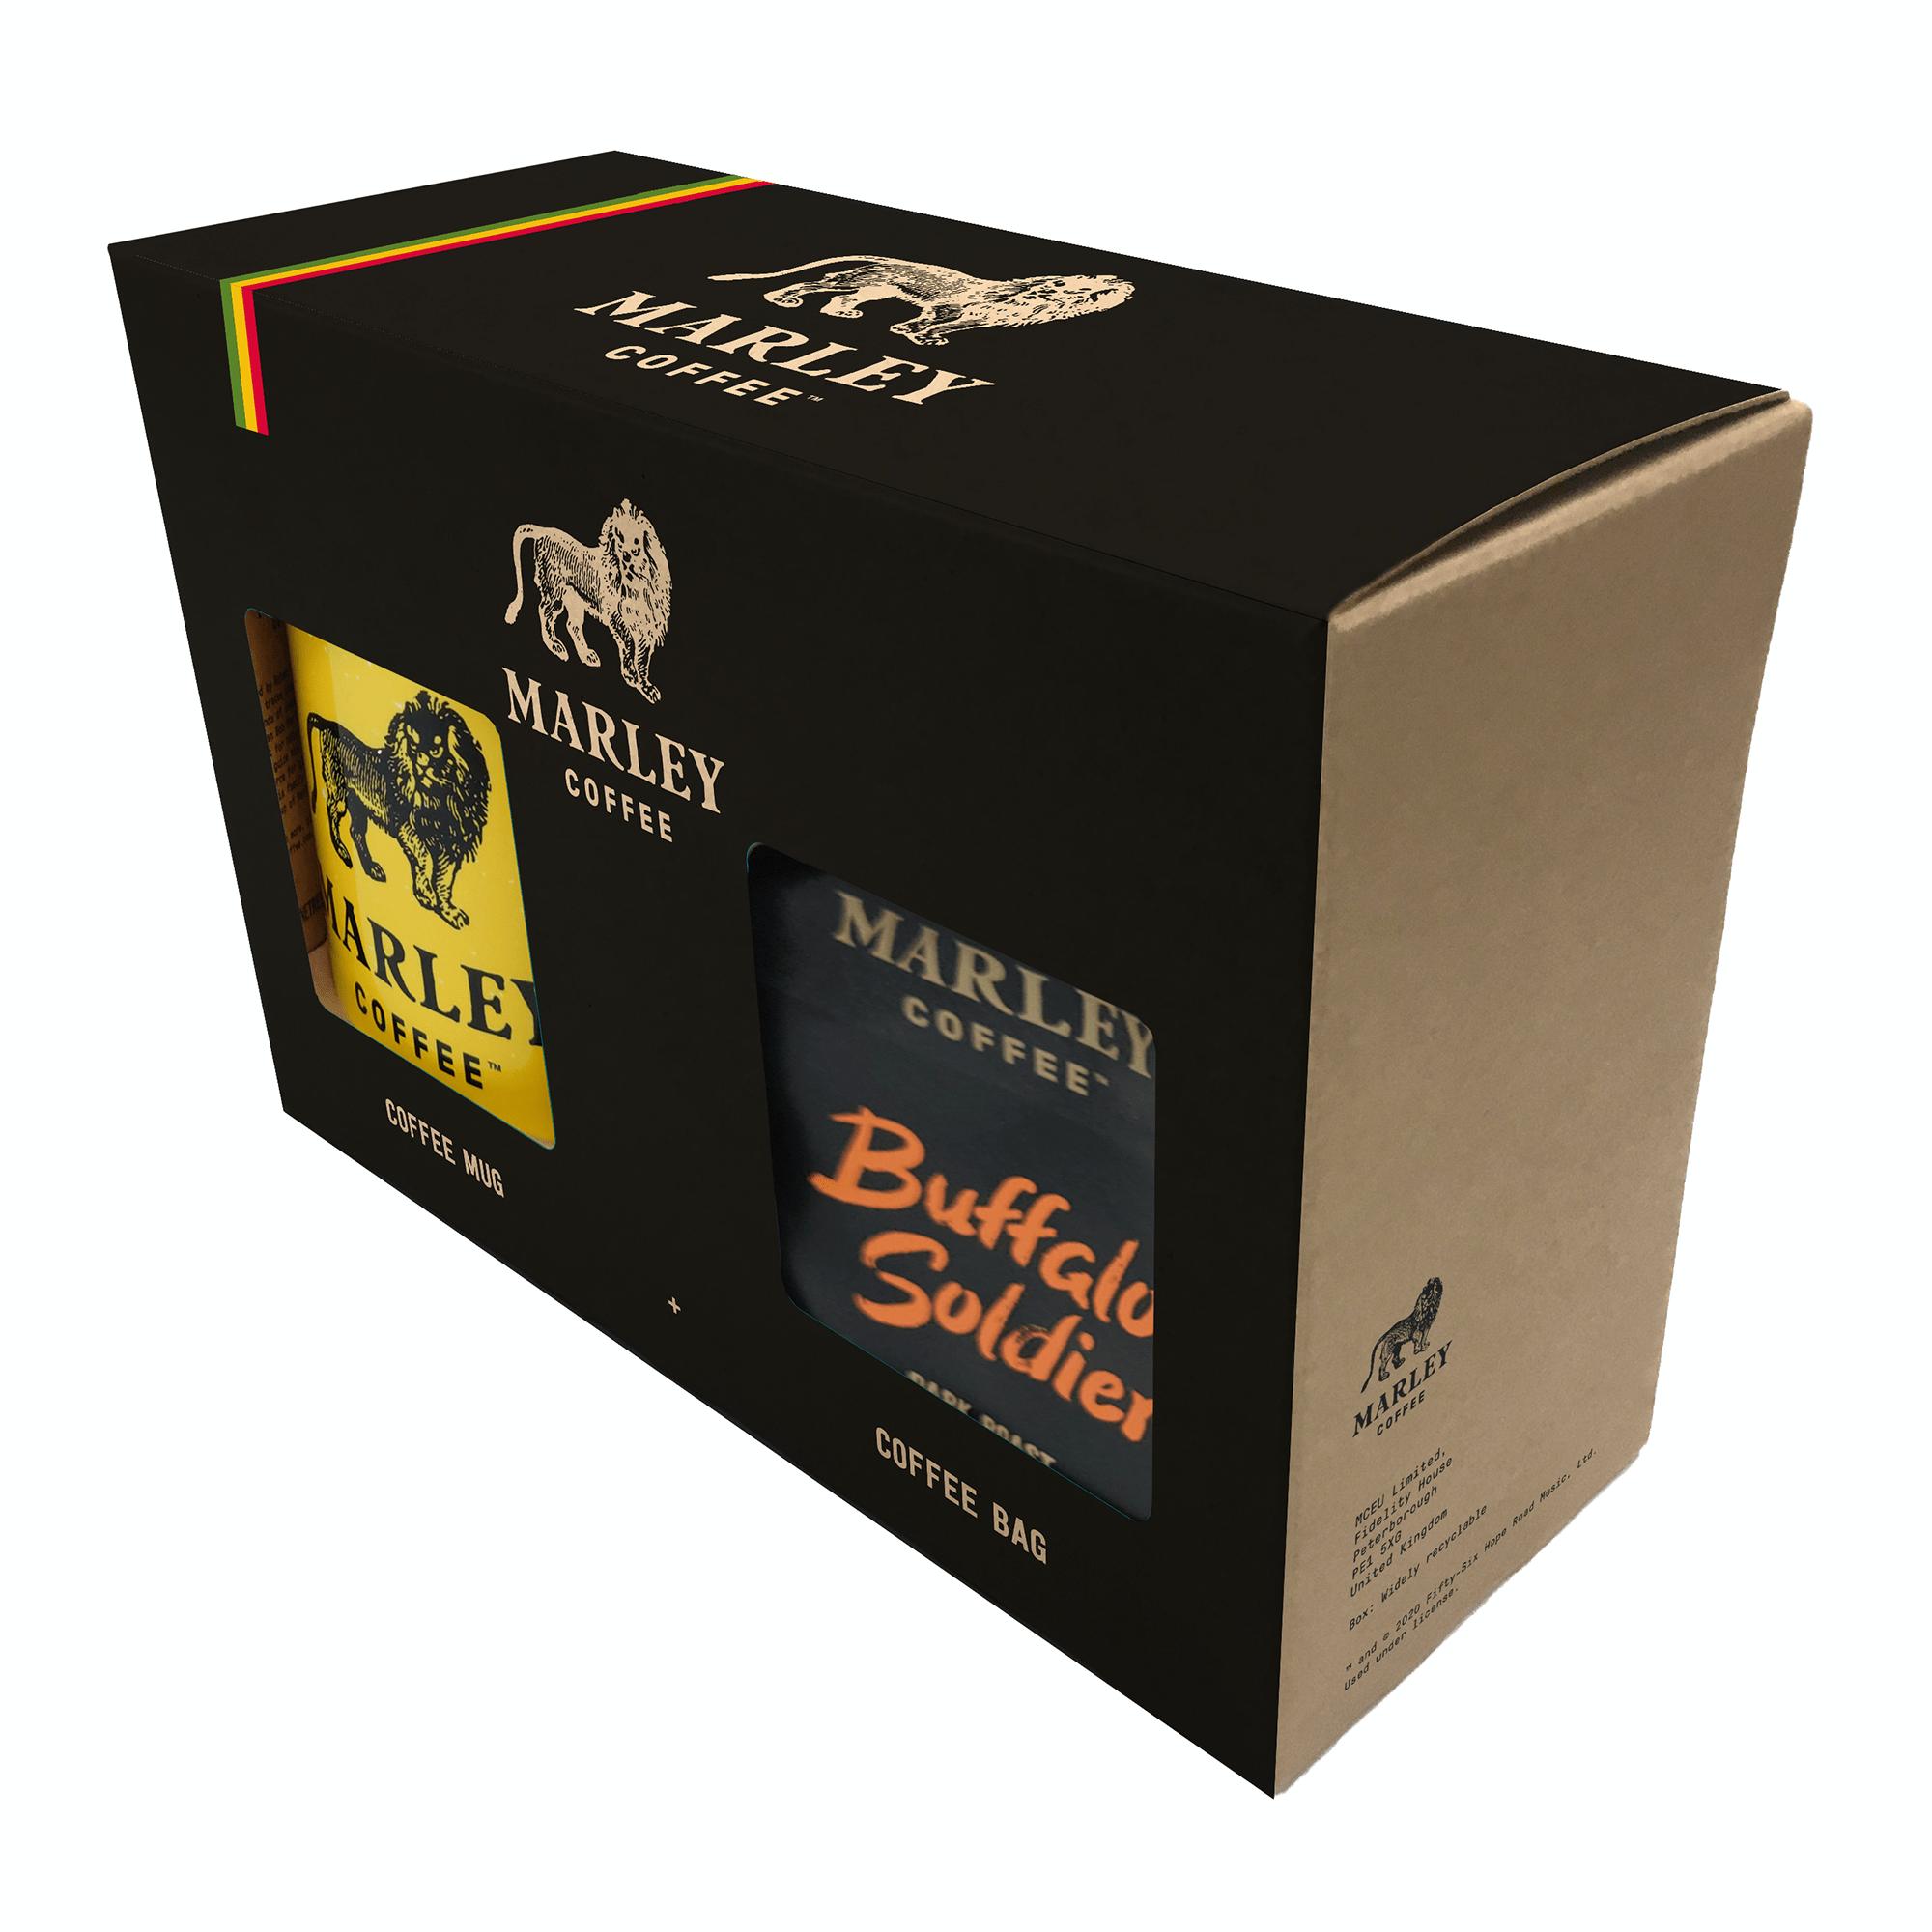 Limited Edition Xmas Gift Box